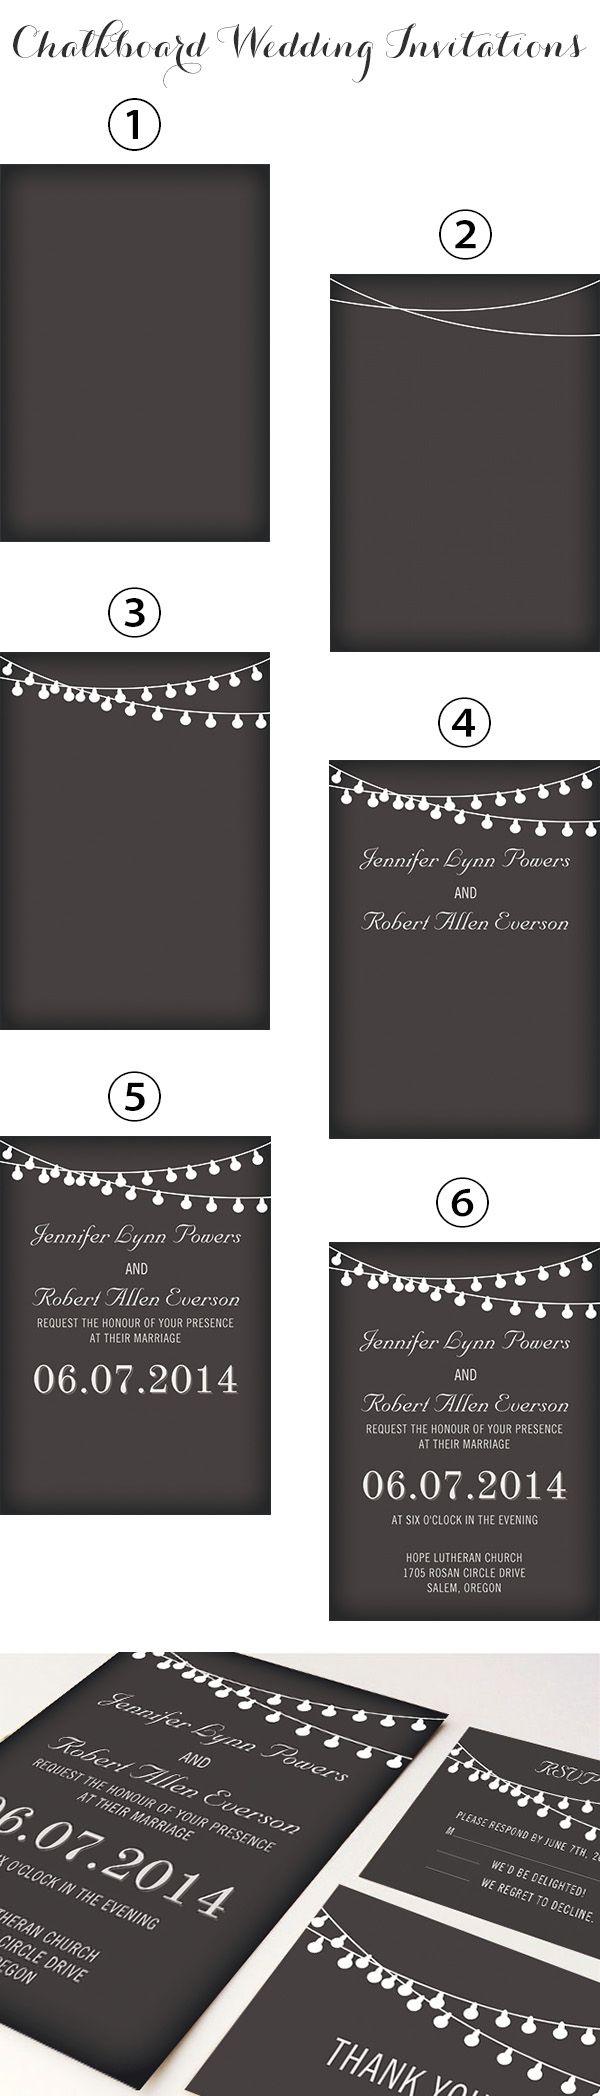 rustic themed chalkboard wedding invitations with string lights inspired by backyard wedding ideas